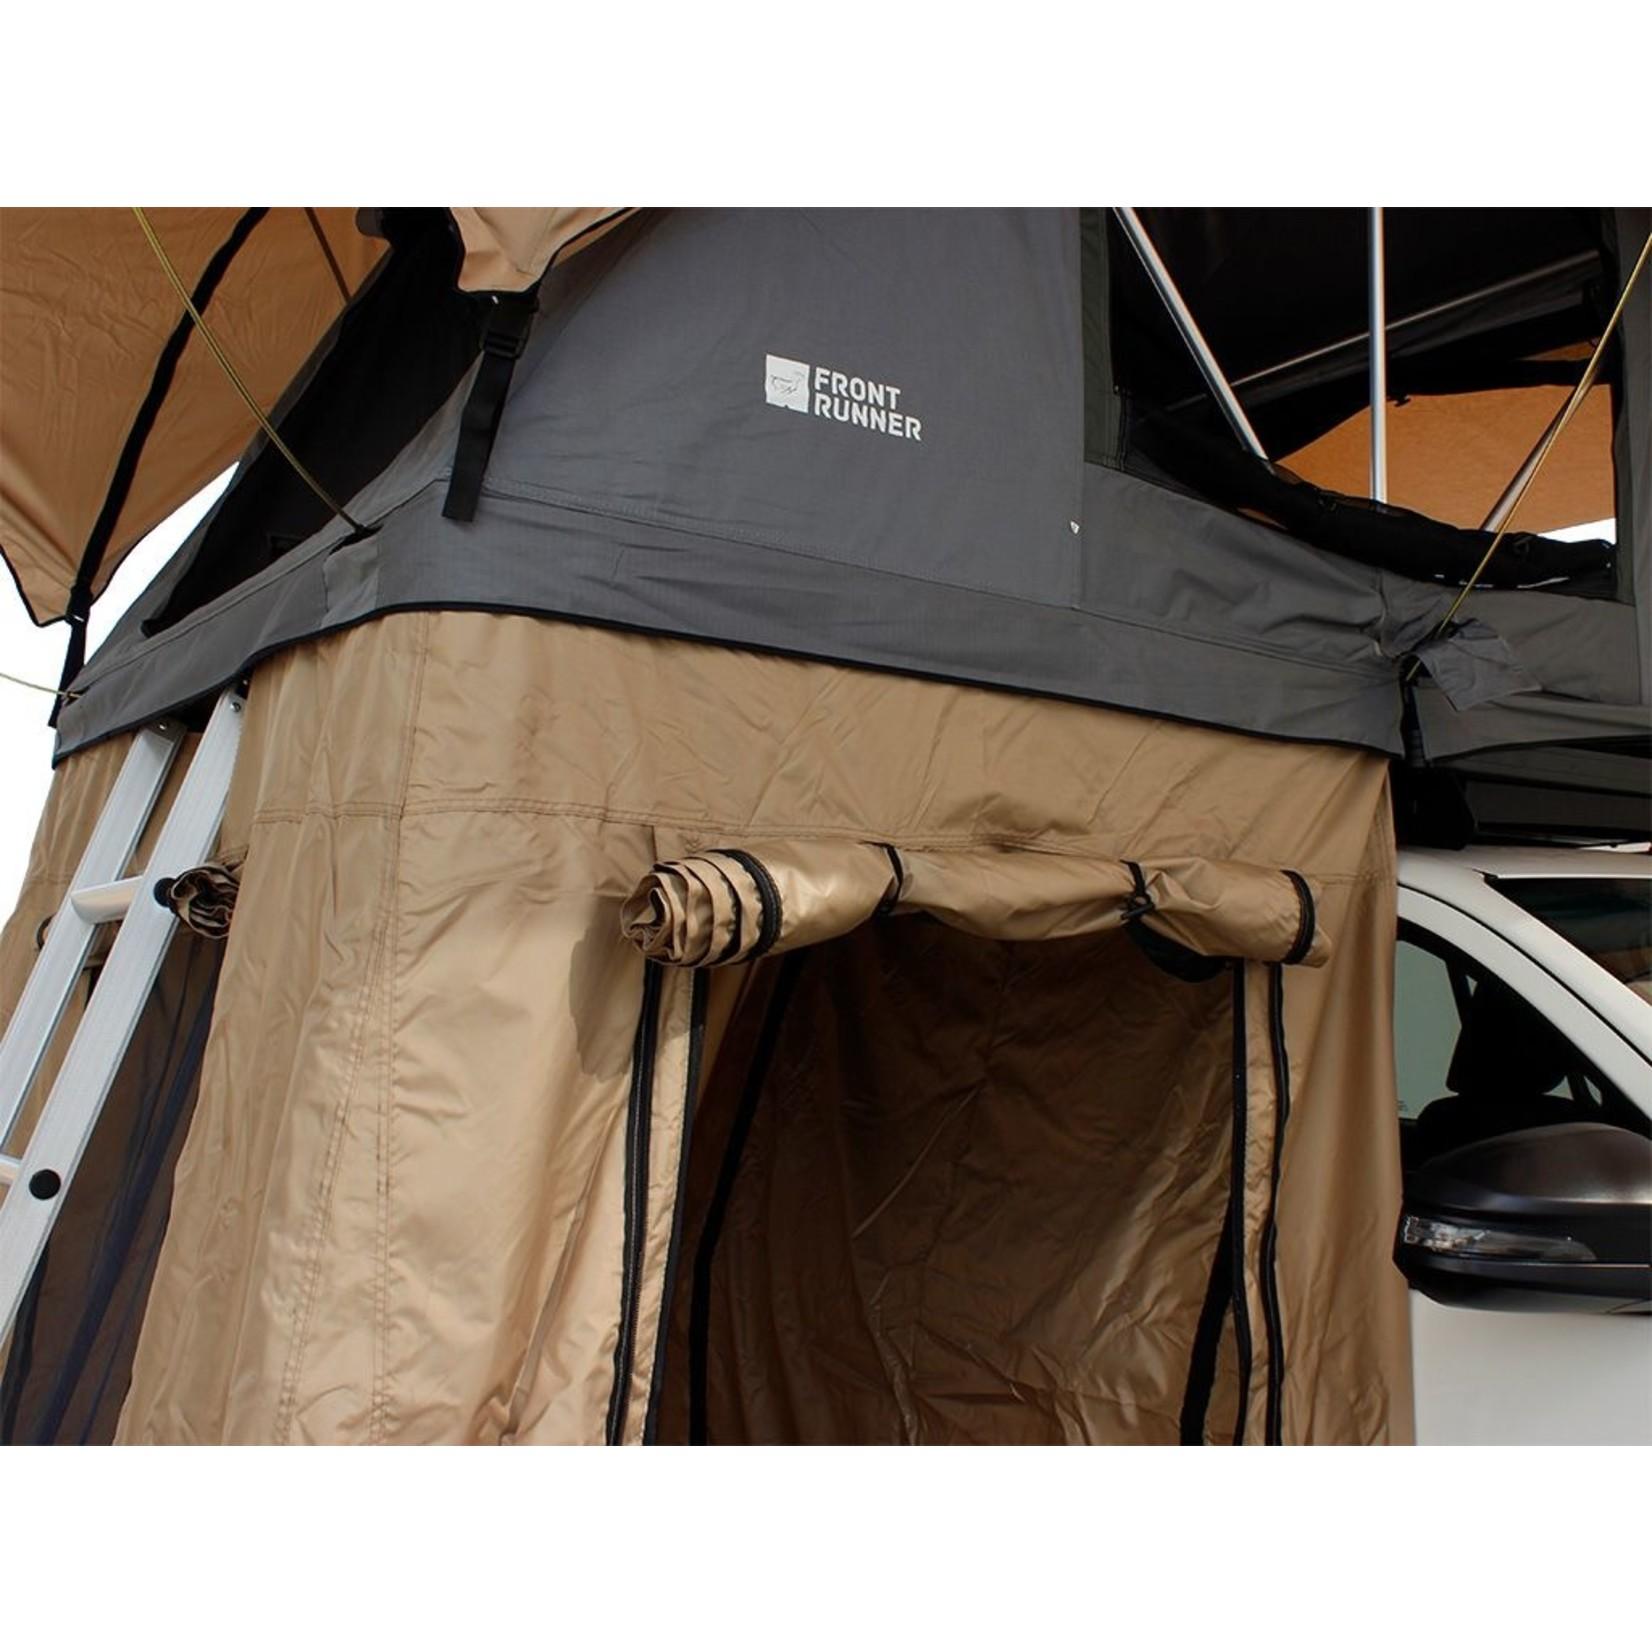 Front Runner Front Runner Roof Top Tent Annex